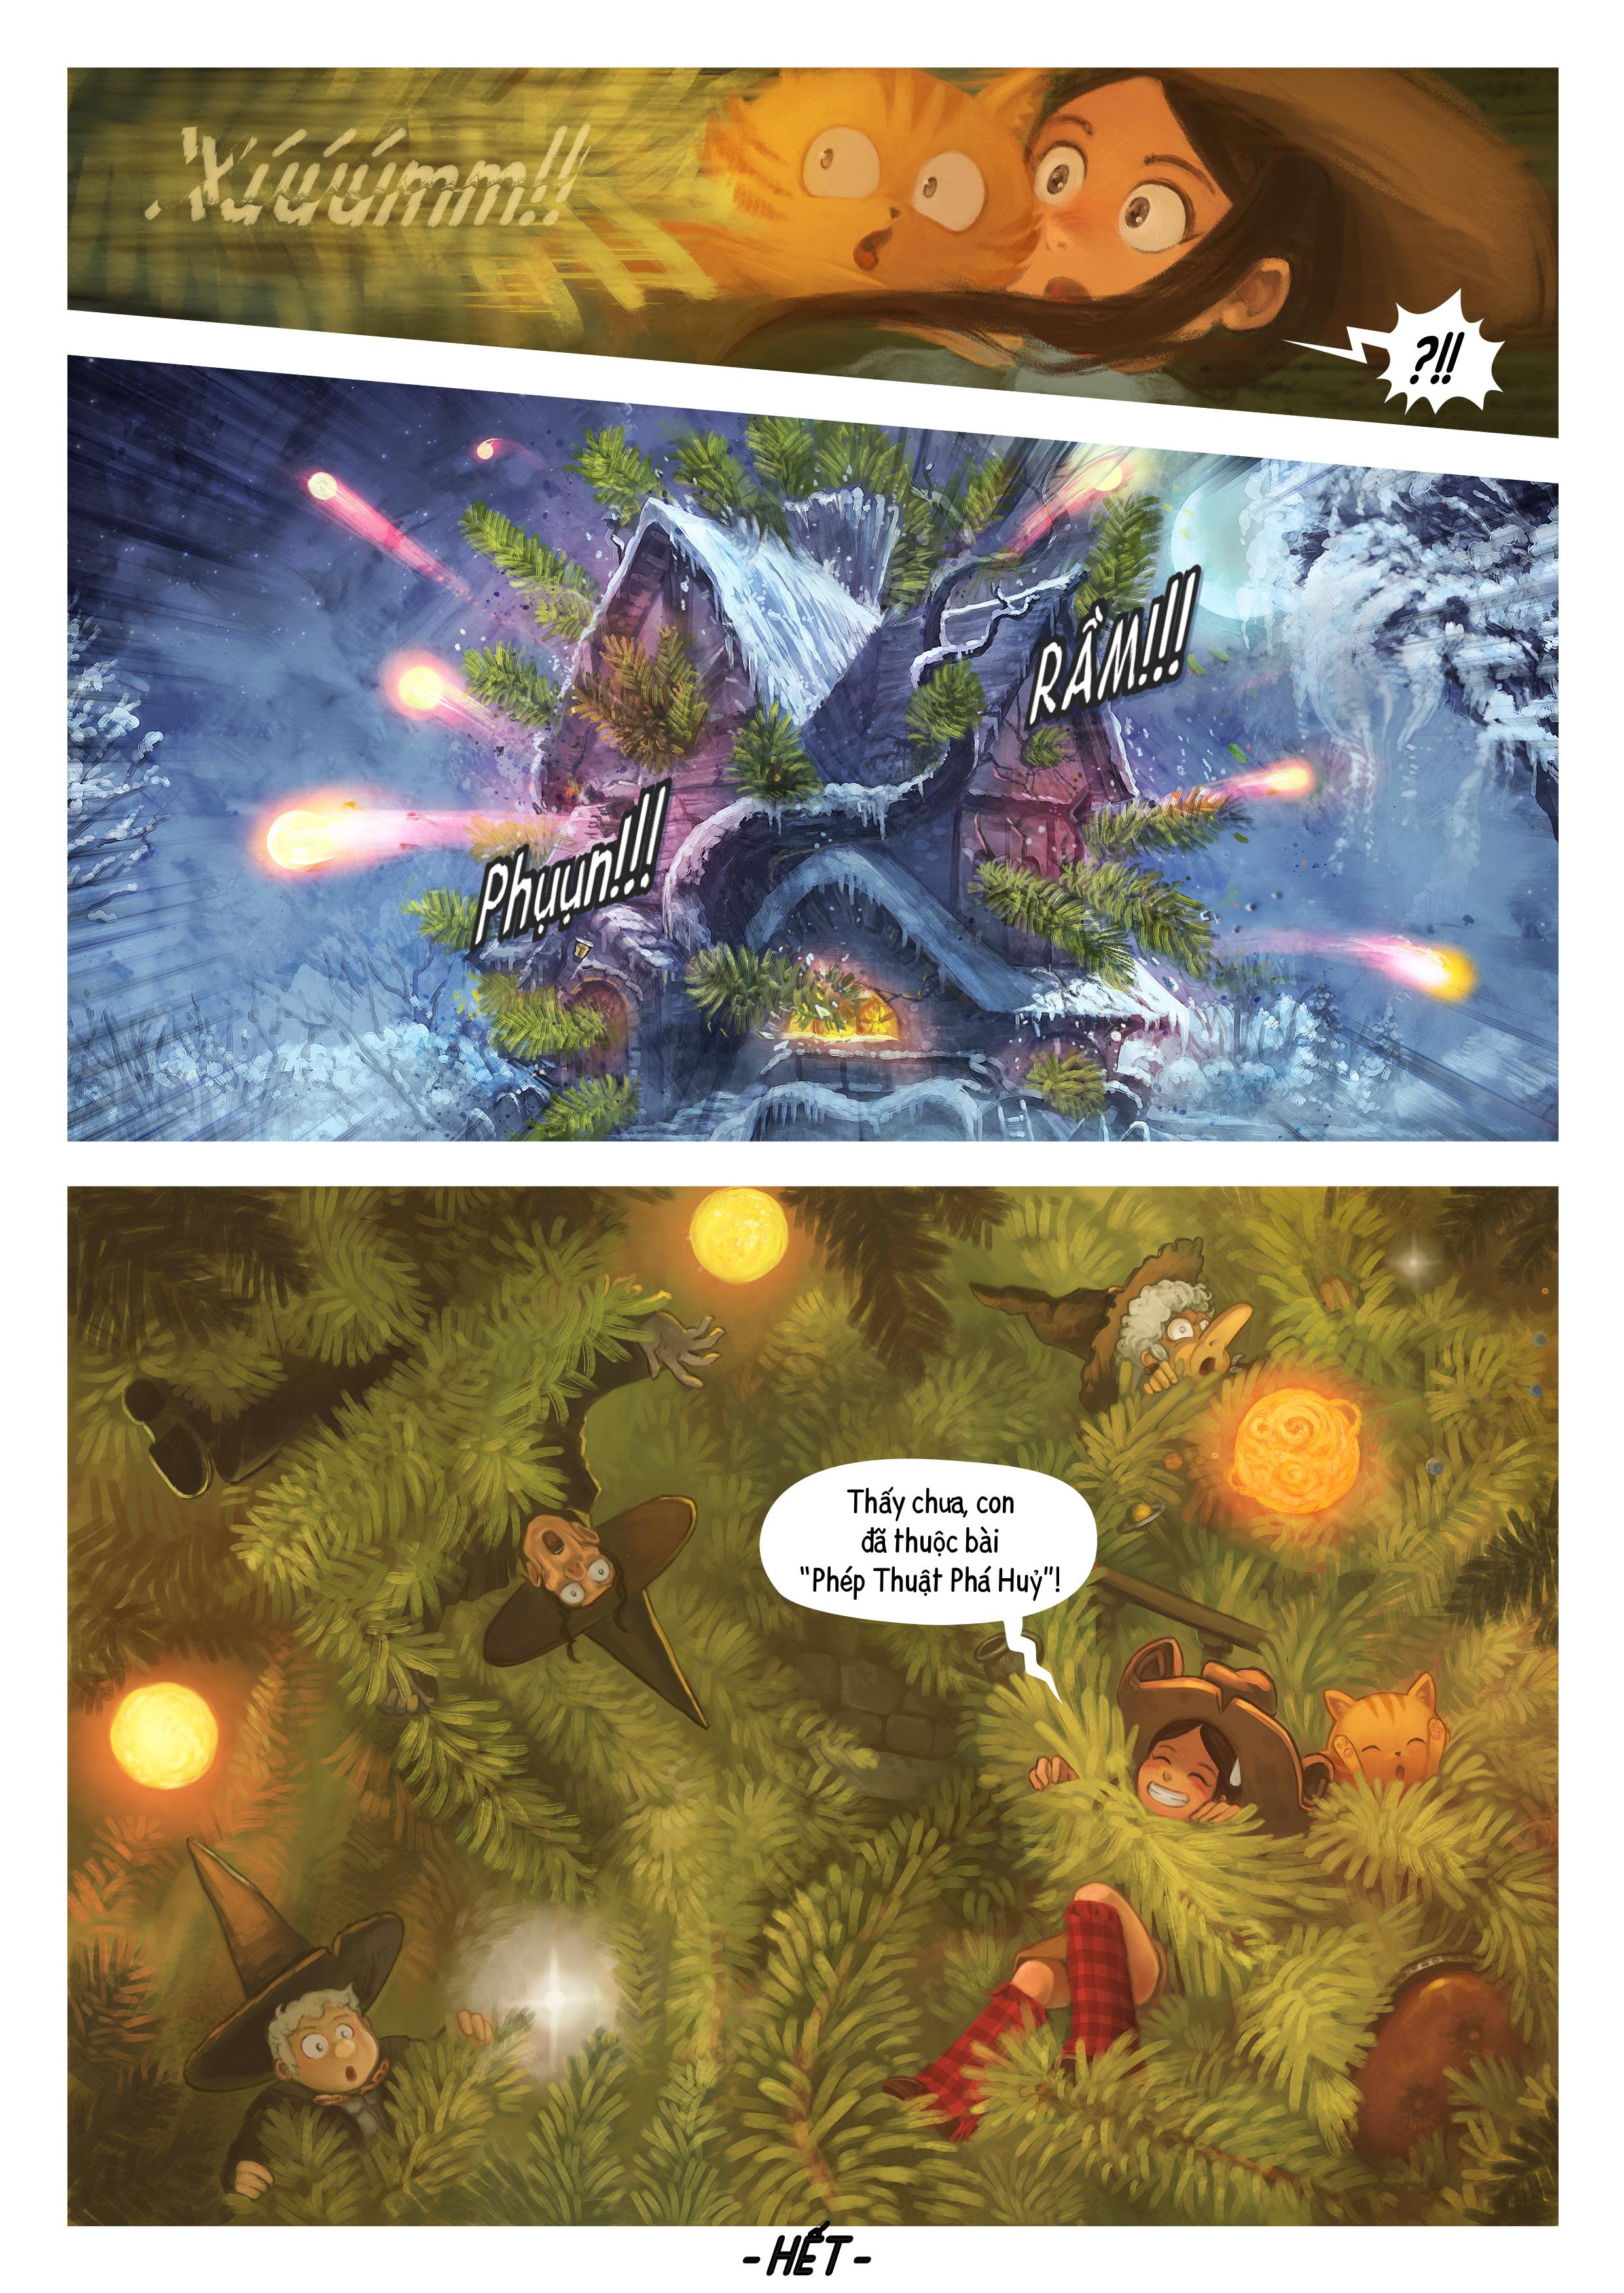 A webcomic page of Pepper&Carrot, Tập 24 [vi], trang 7